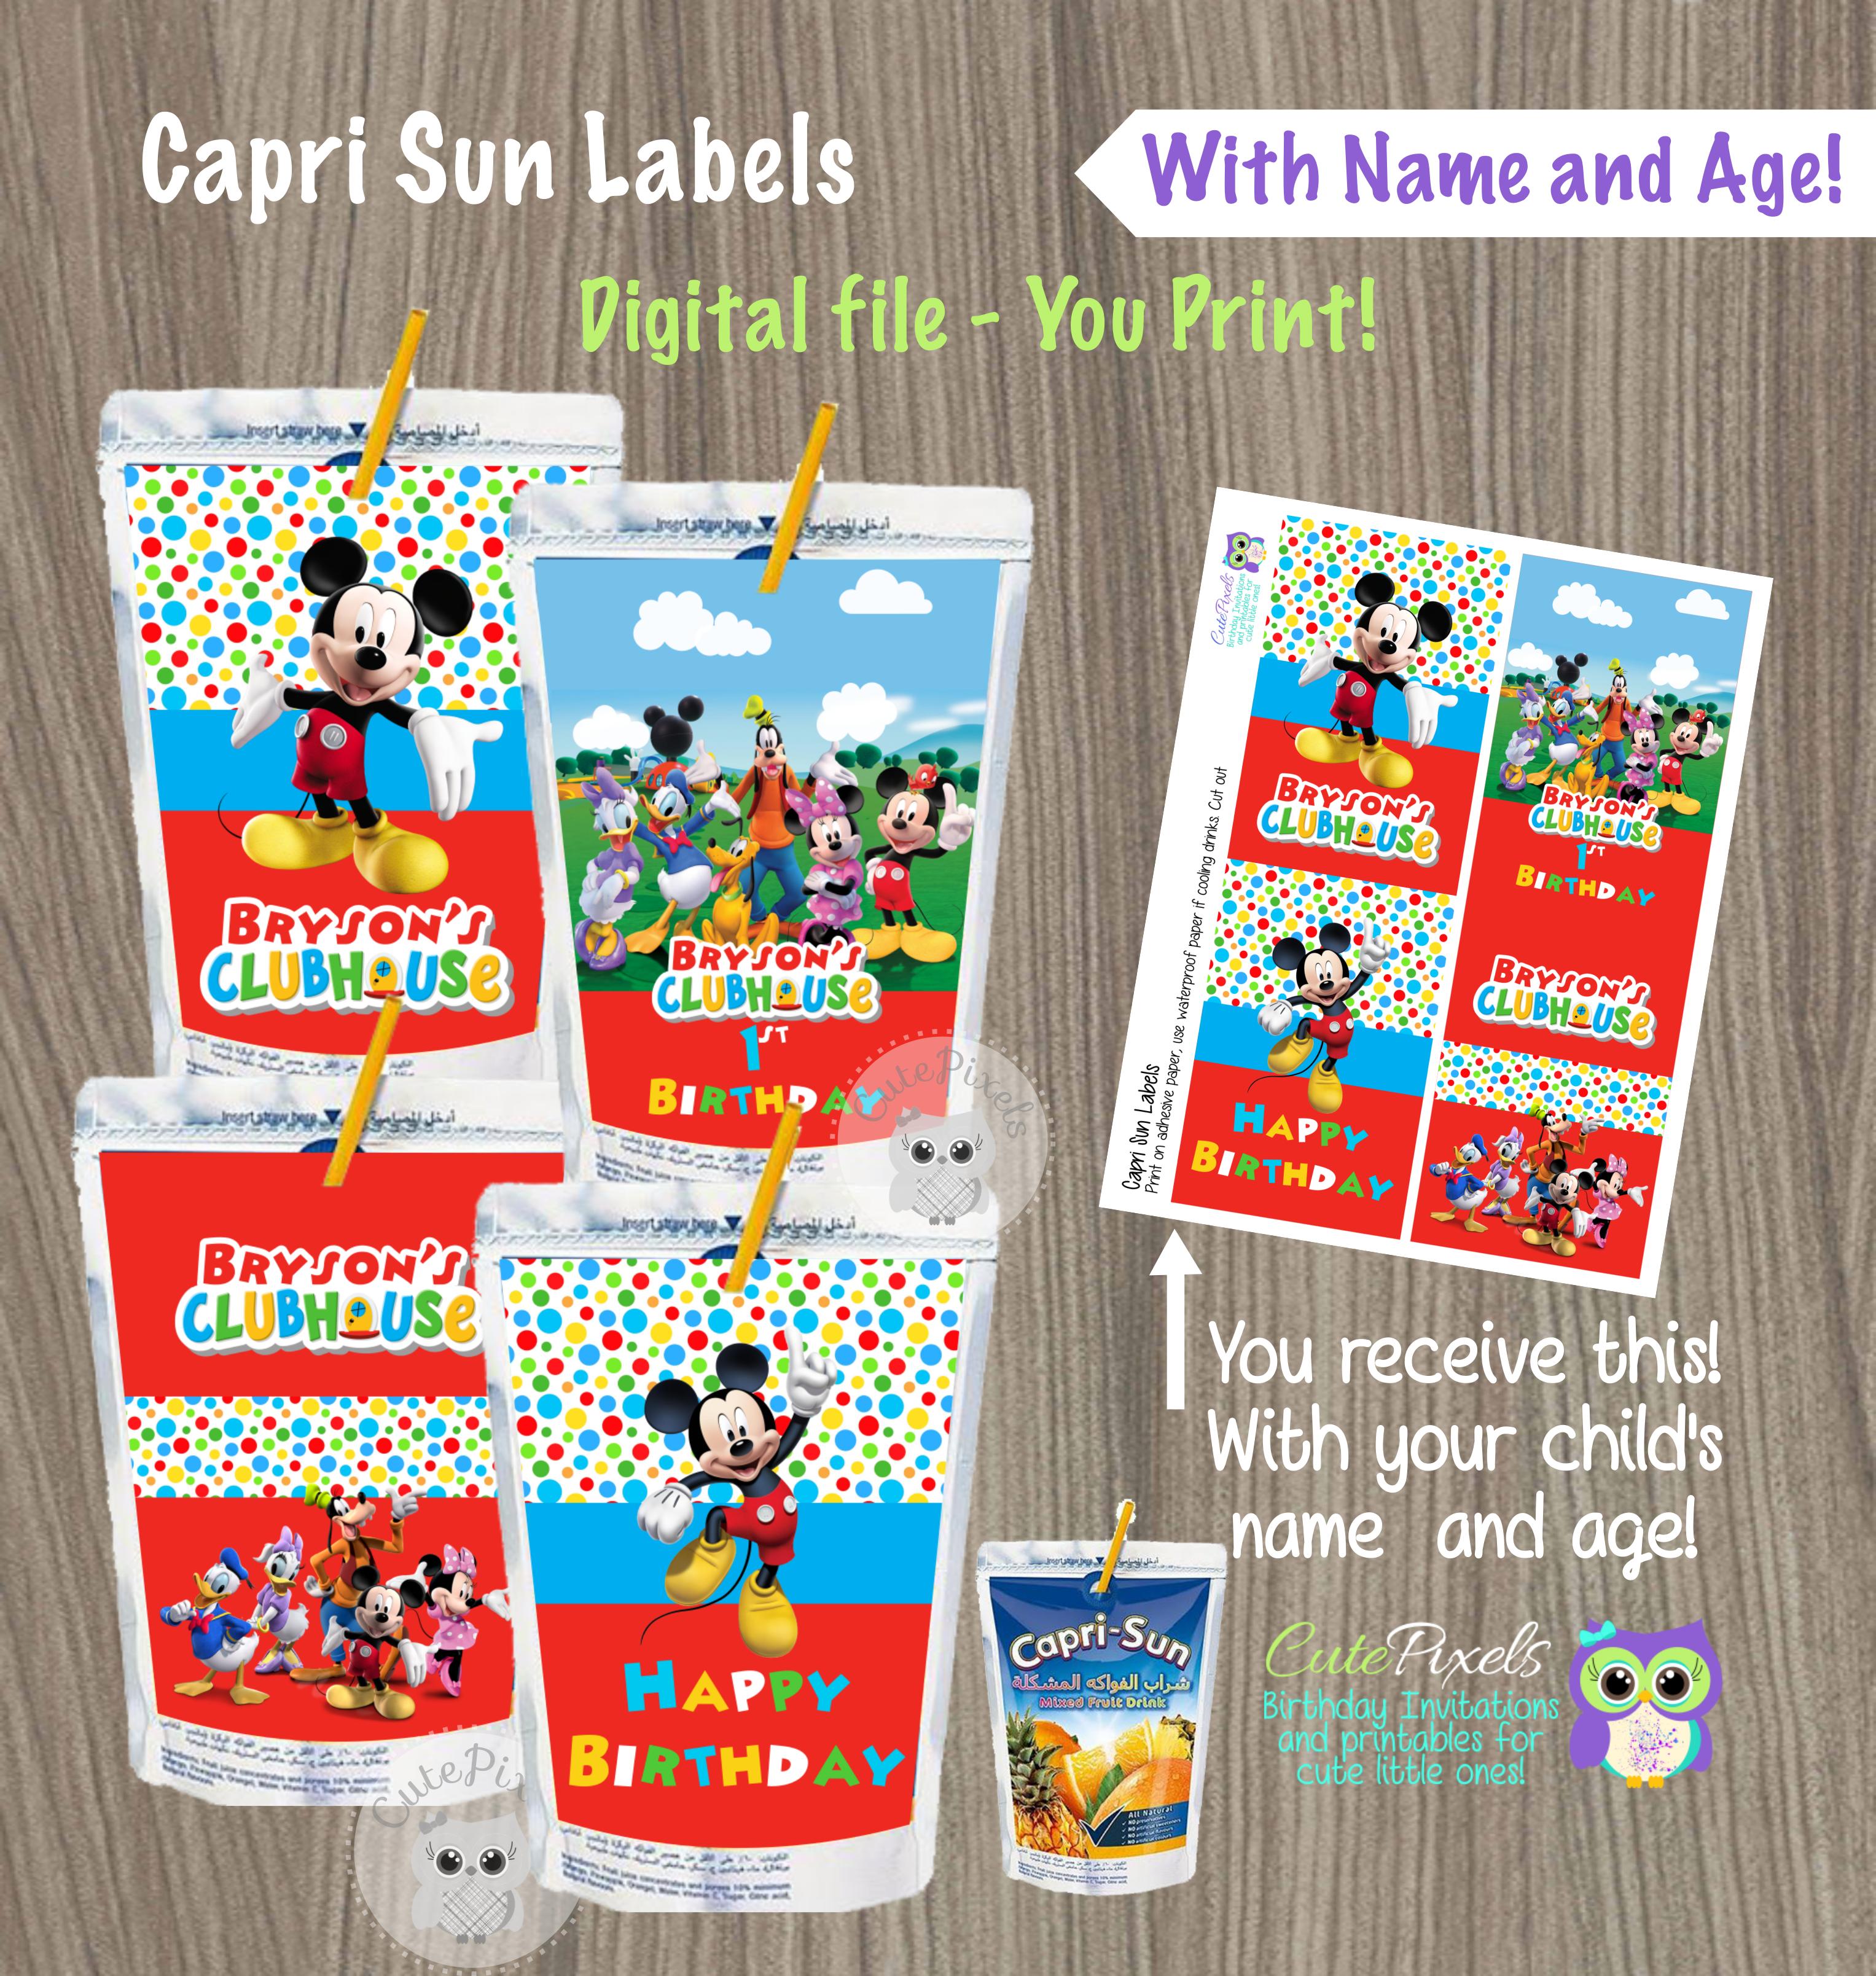 Blank Capri Sun Labels Template Capri Sun Mockup Capri Sun Labels Png Canva Silhouette Custom Juice Labels Label Templates Capri Sun Templates Printable Free